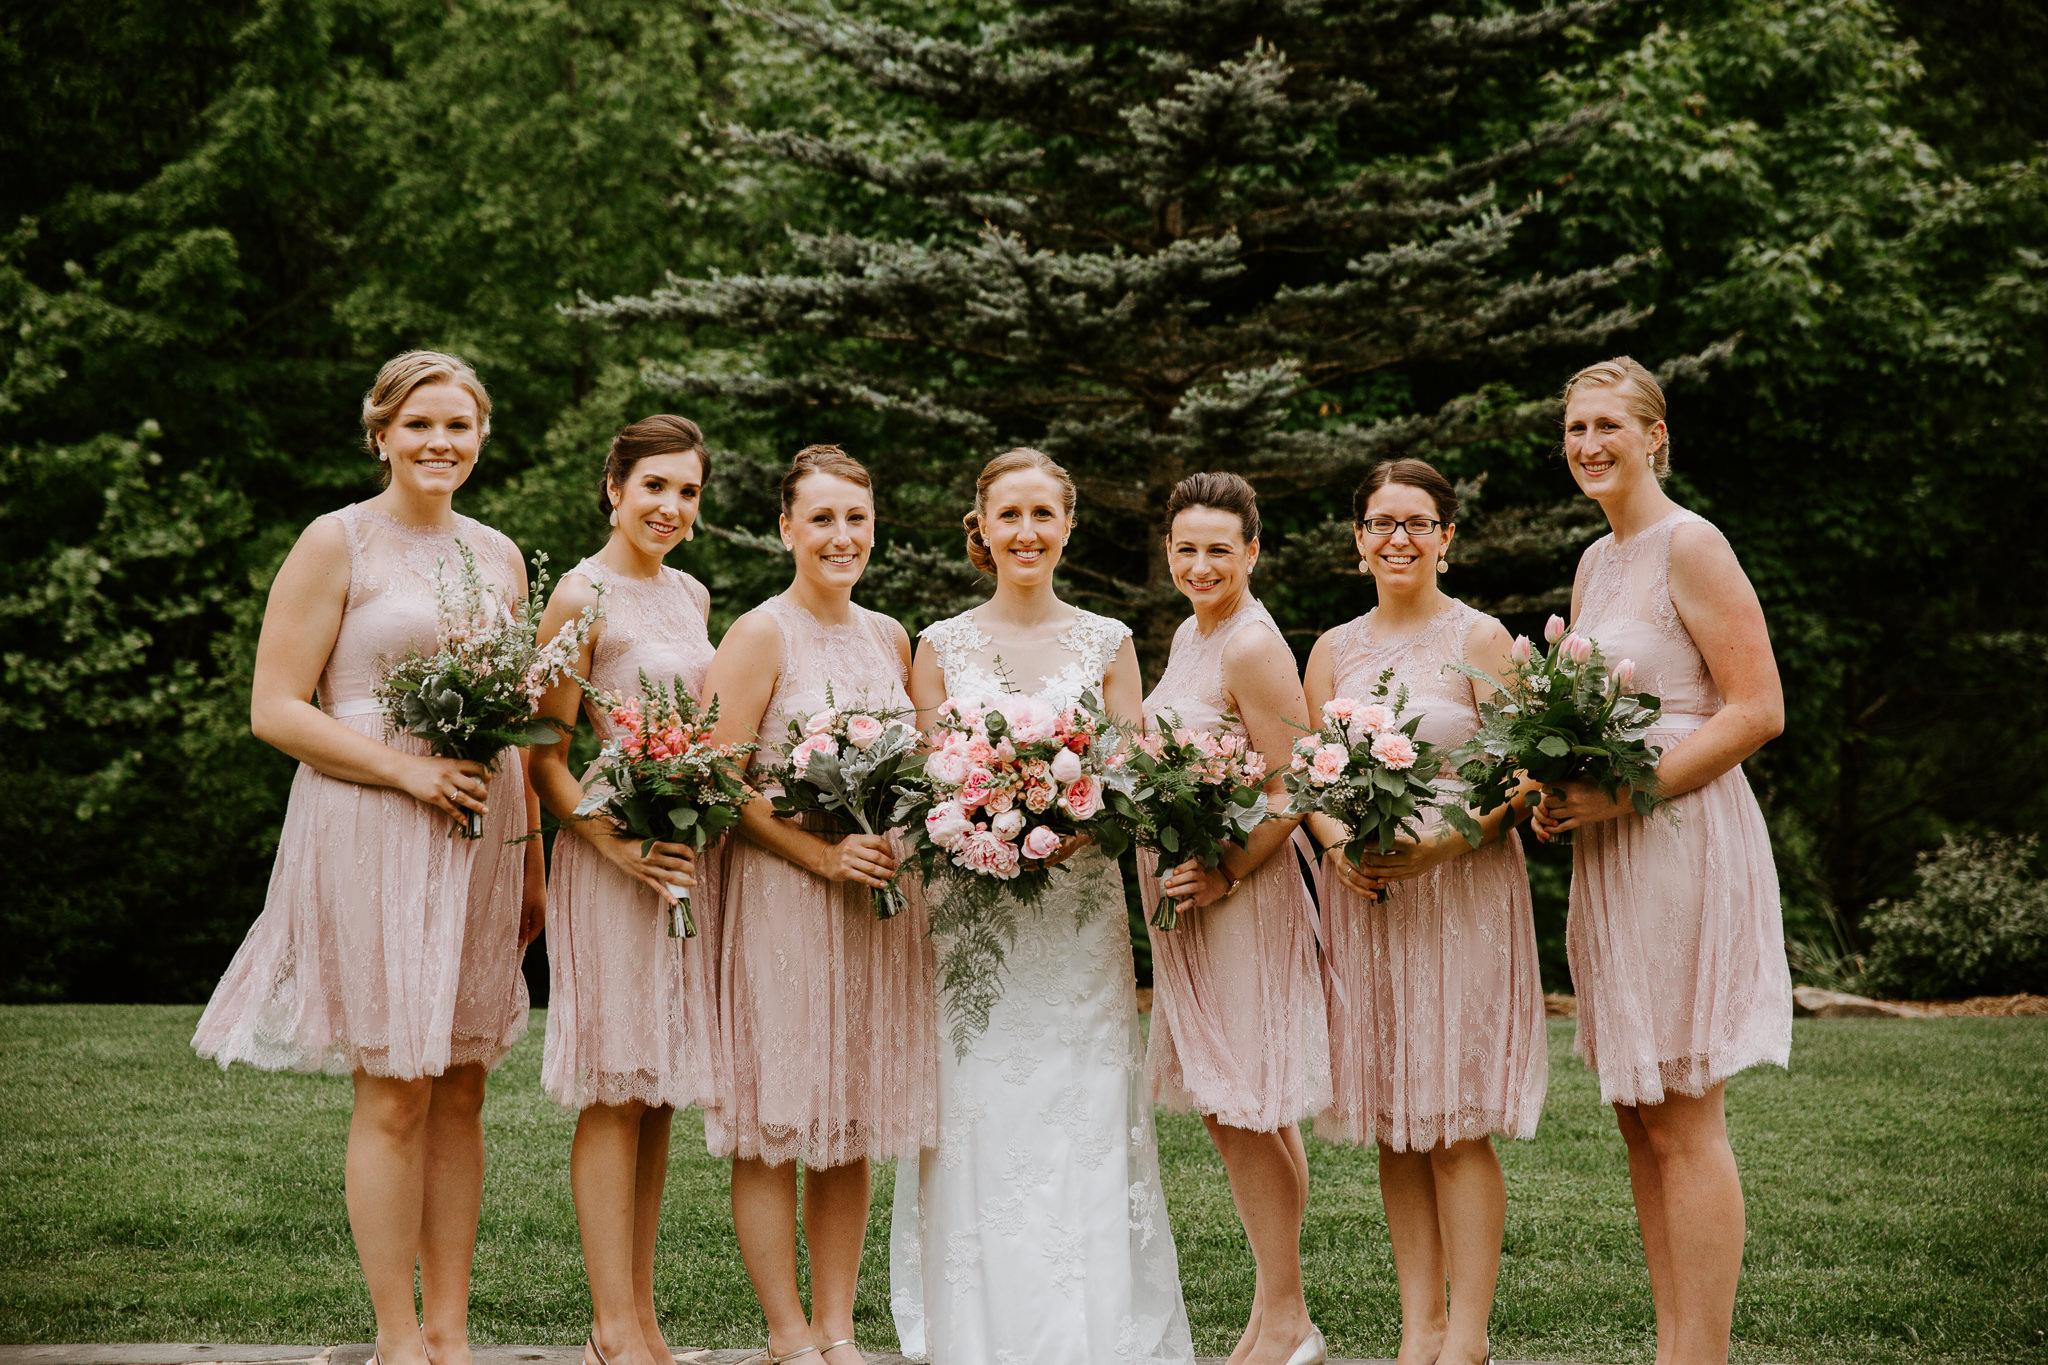 House Mountain Inn - Weddings - Lexington - Virginia - Best Wedding Photographer - Pat Cori Photography-38.jpg